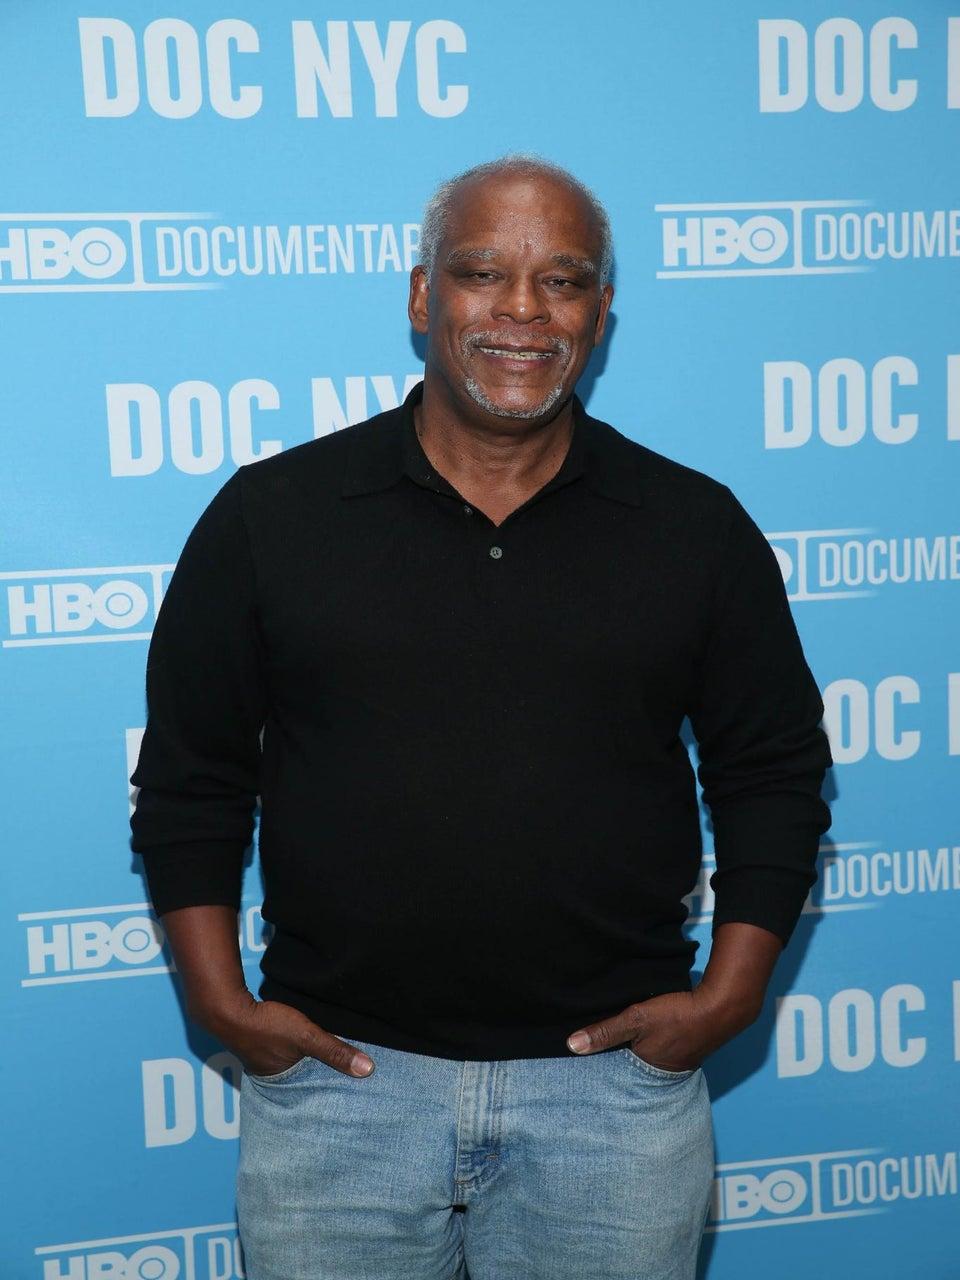 Filmmaker Stanley Nelson Announces New HBCU Documentary for PBS